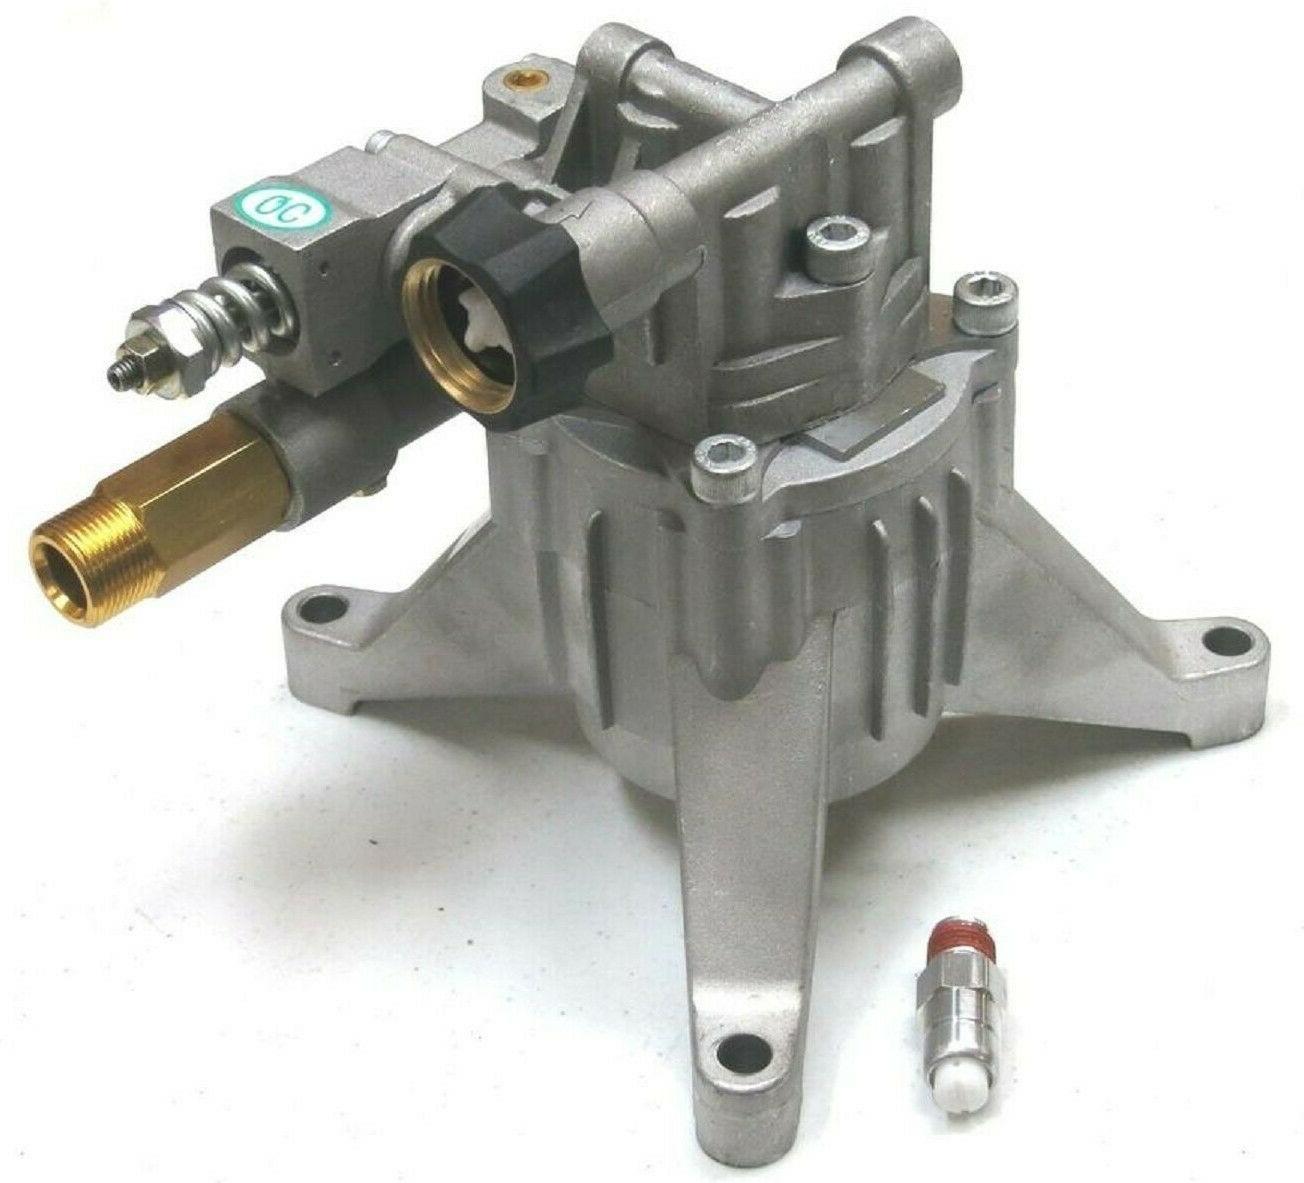 Pressure Washer Pump 7/8in Shaft Homelite Ryobi Honda Engine